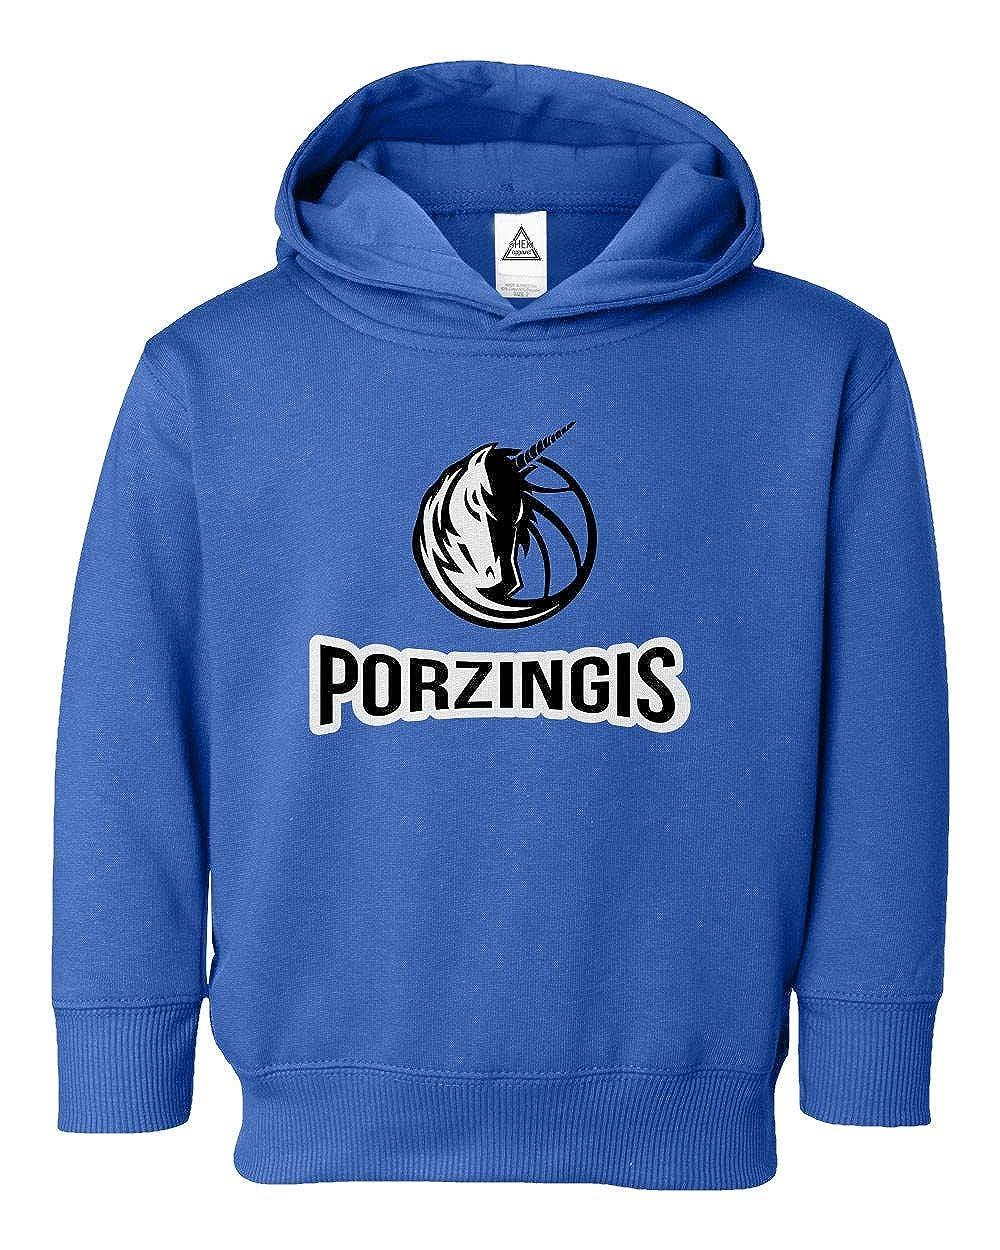 Sheki Apparel Dallas Porzingis Basketball Fans Little Kids Pullover Hoodie Toddler Sweatshirt